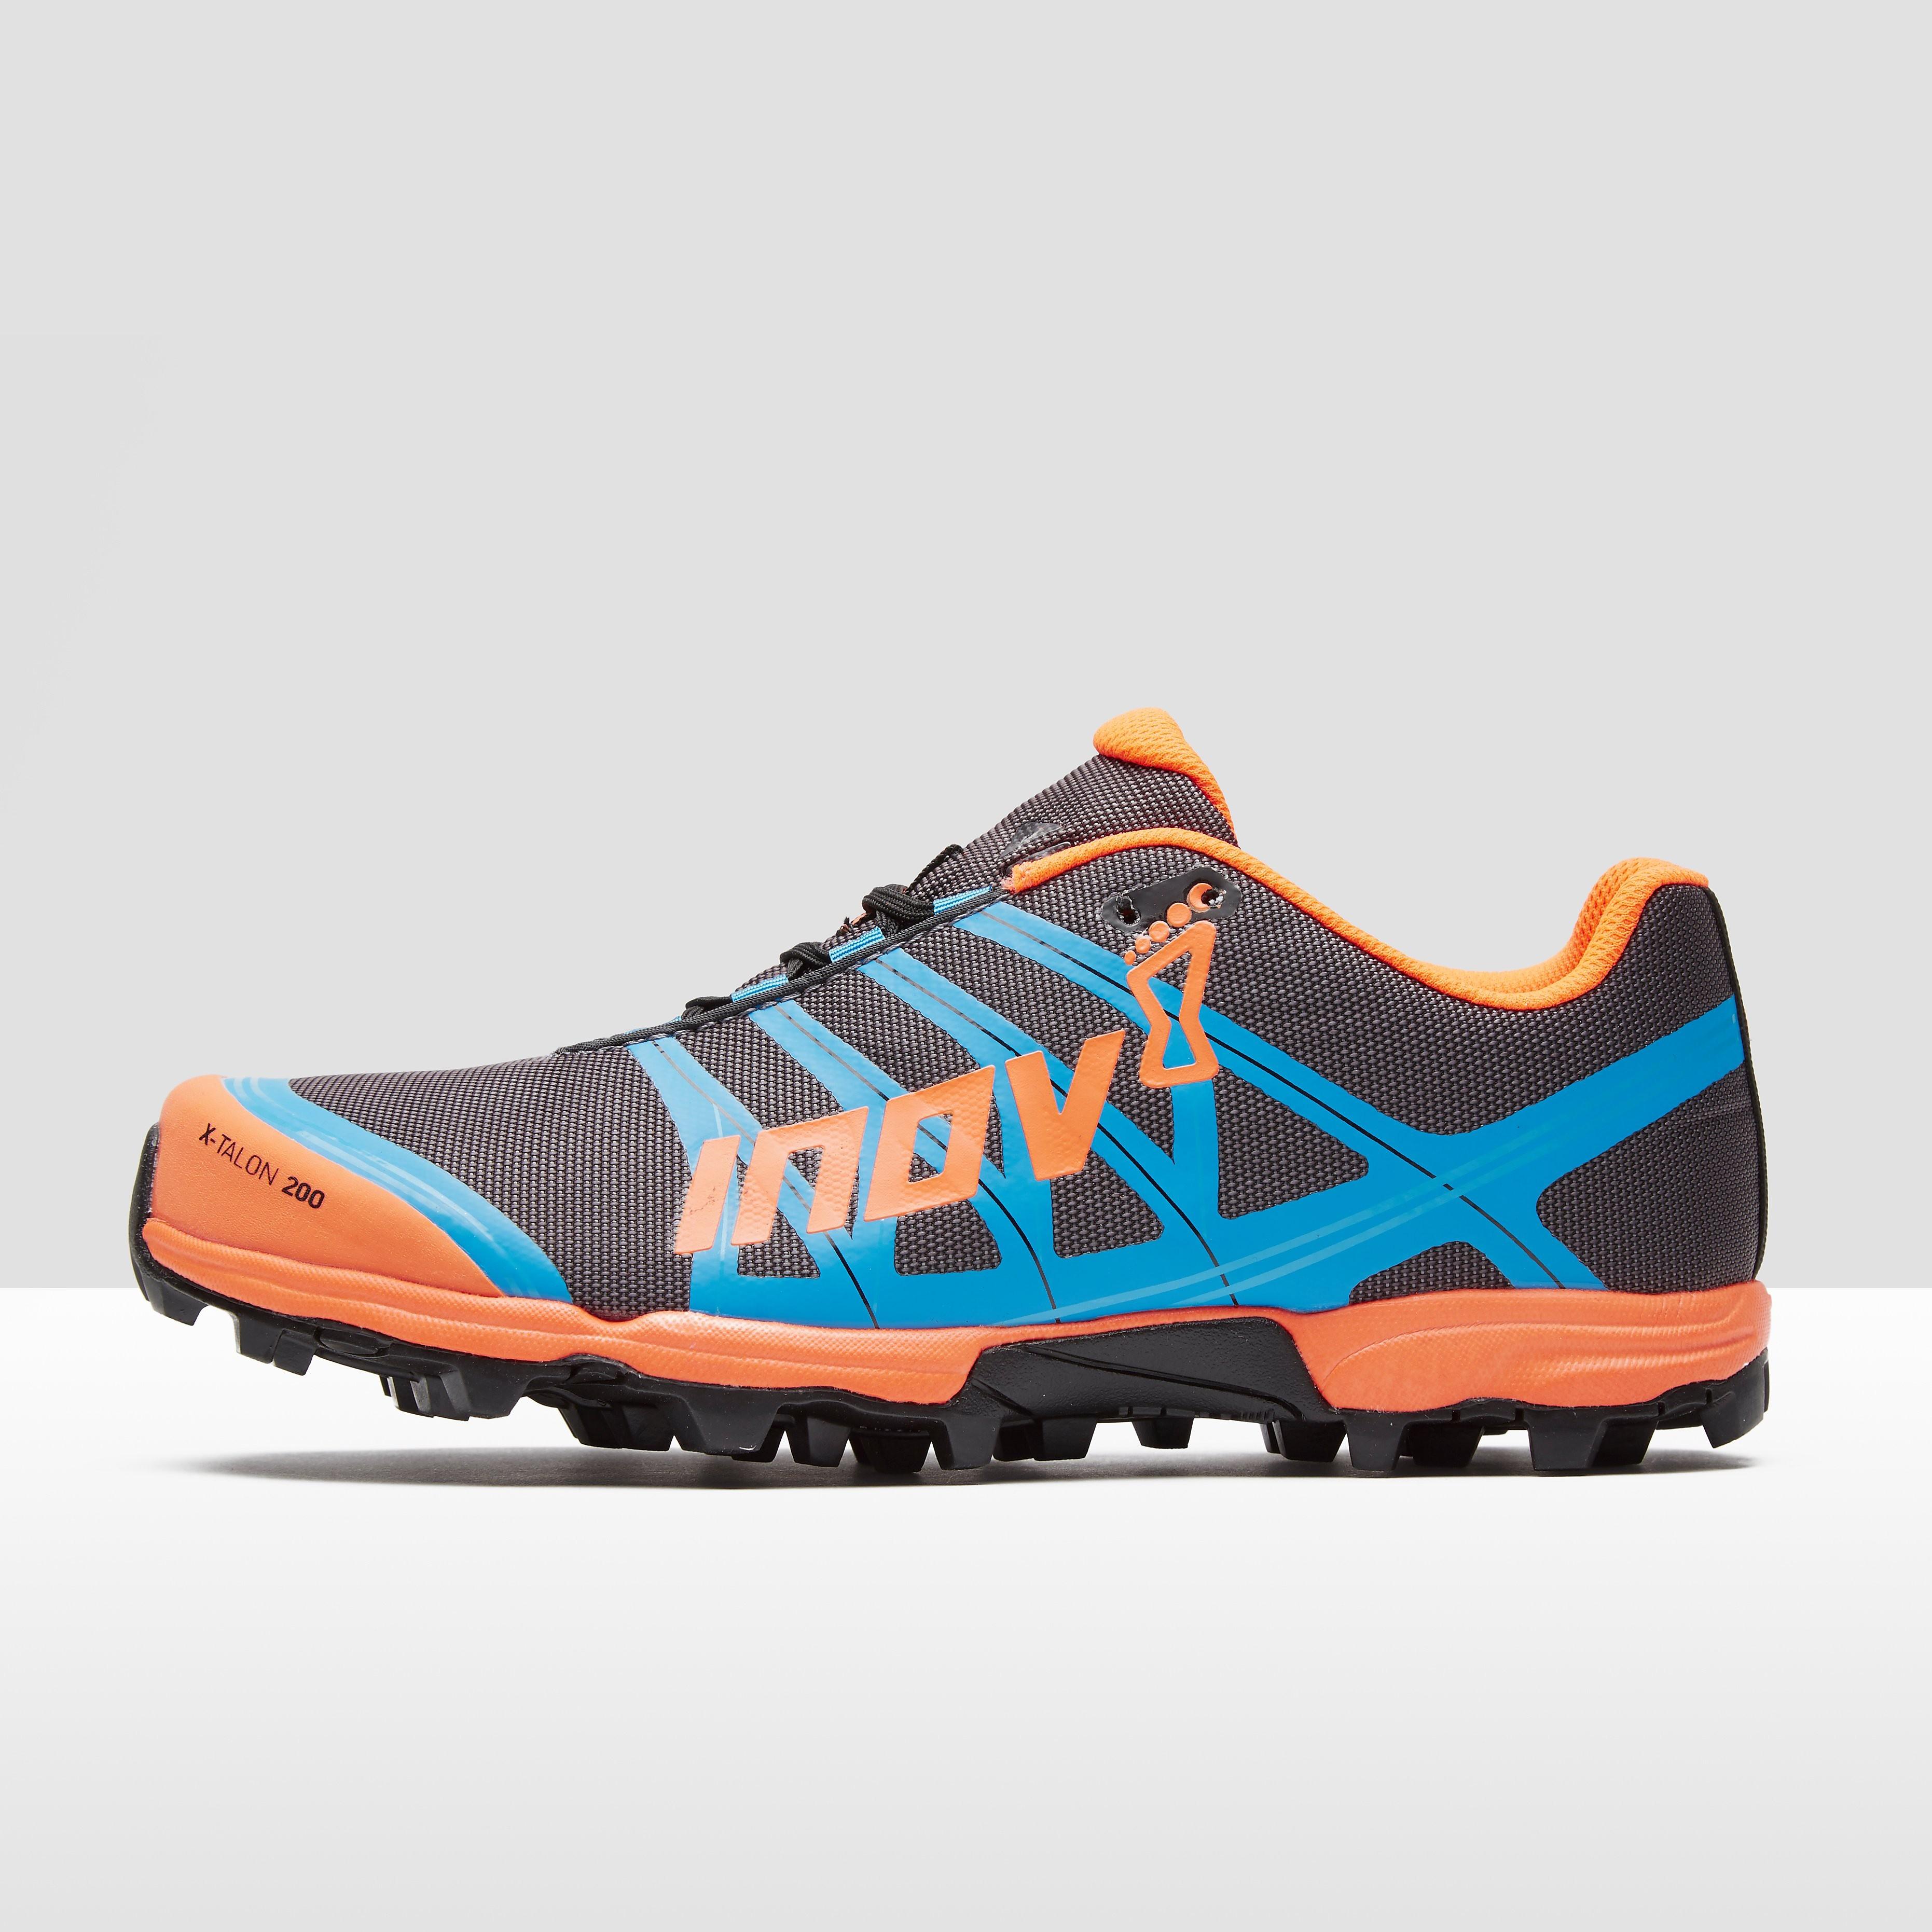 Inov-8 X-Talon 200 Men's Trail Running Shoes